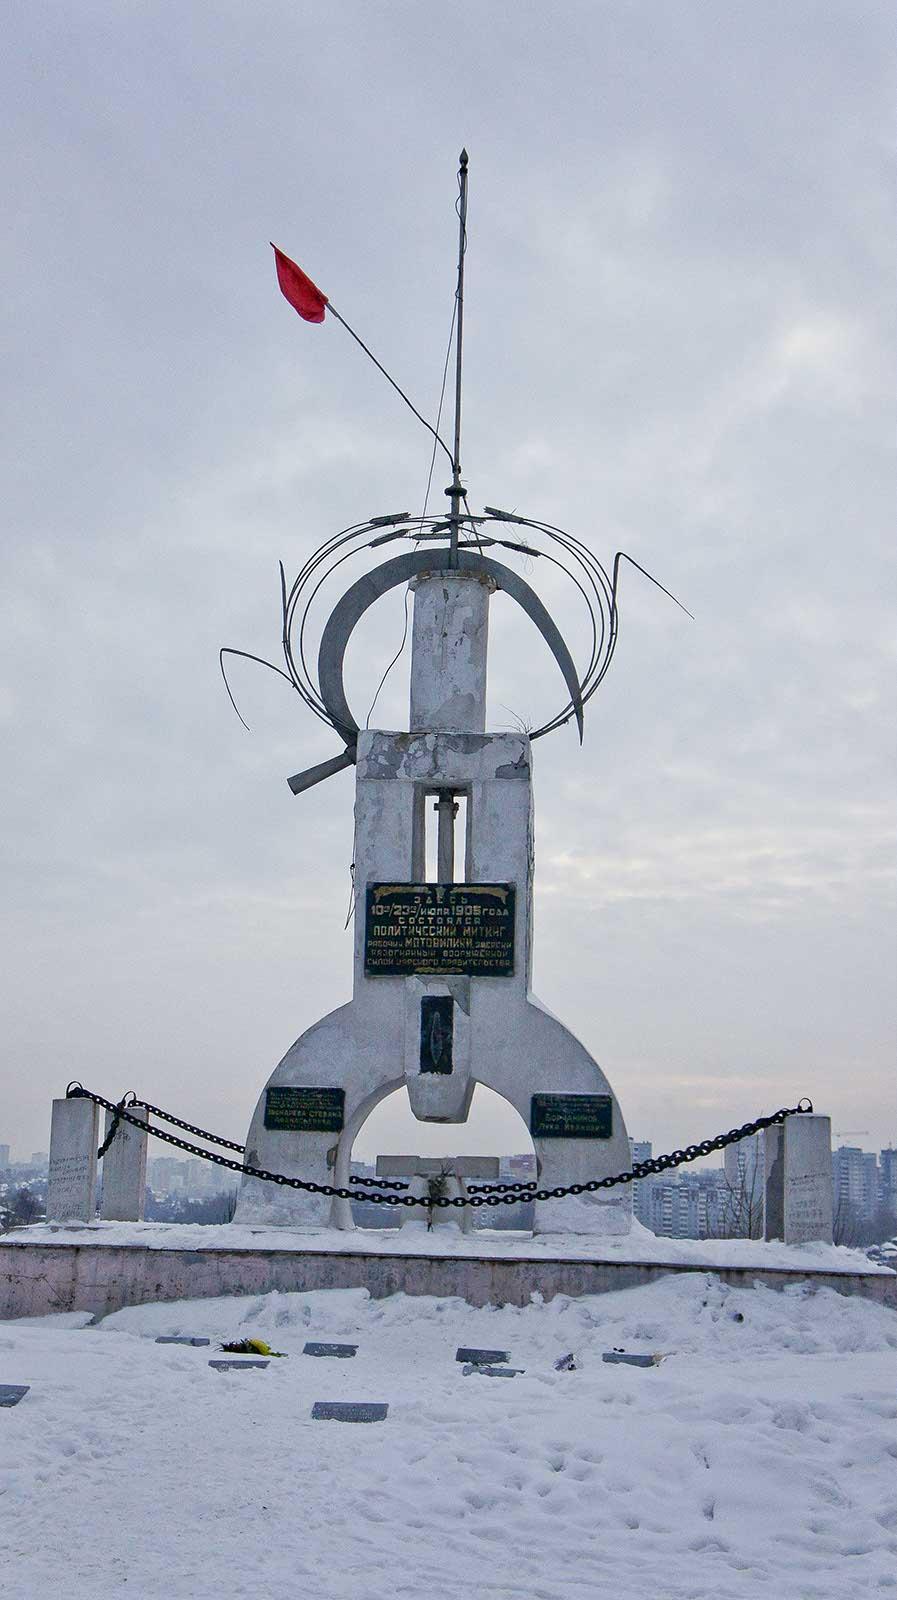 Фото №92243. Памятник «Борцам революции» на горе Вышка